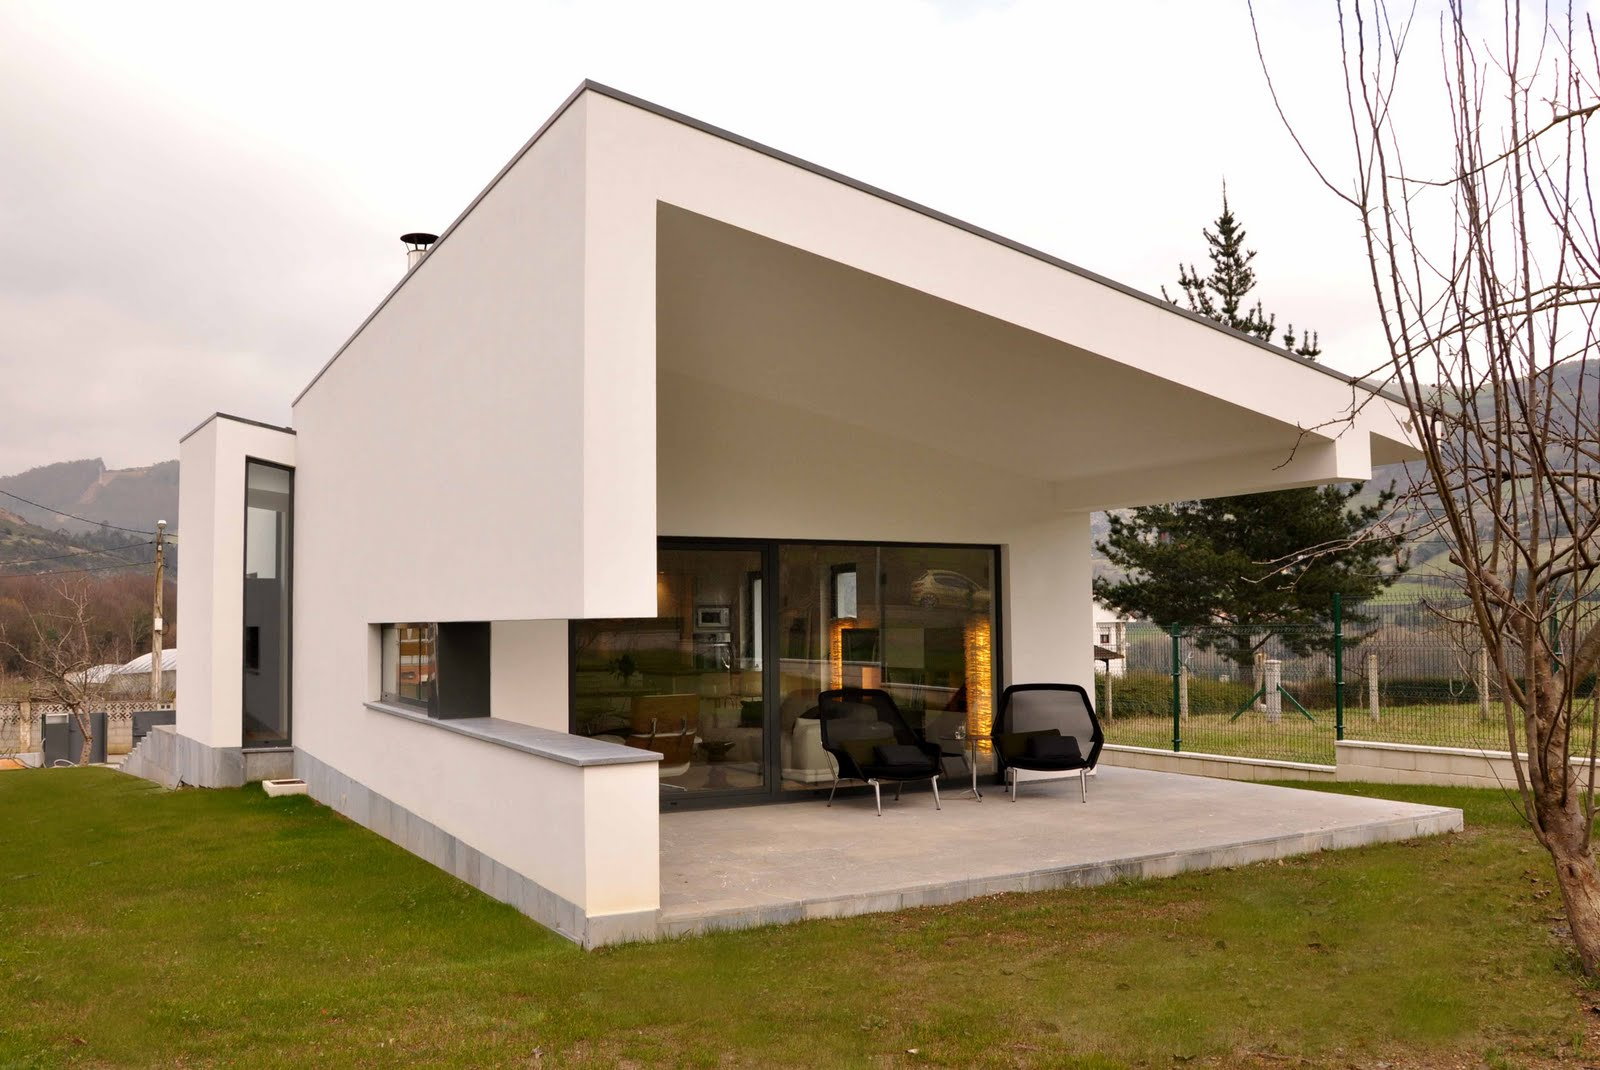 Arquitectura arquidea noviembre 2010 for Arquitectura moderna minimalista